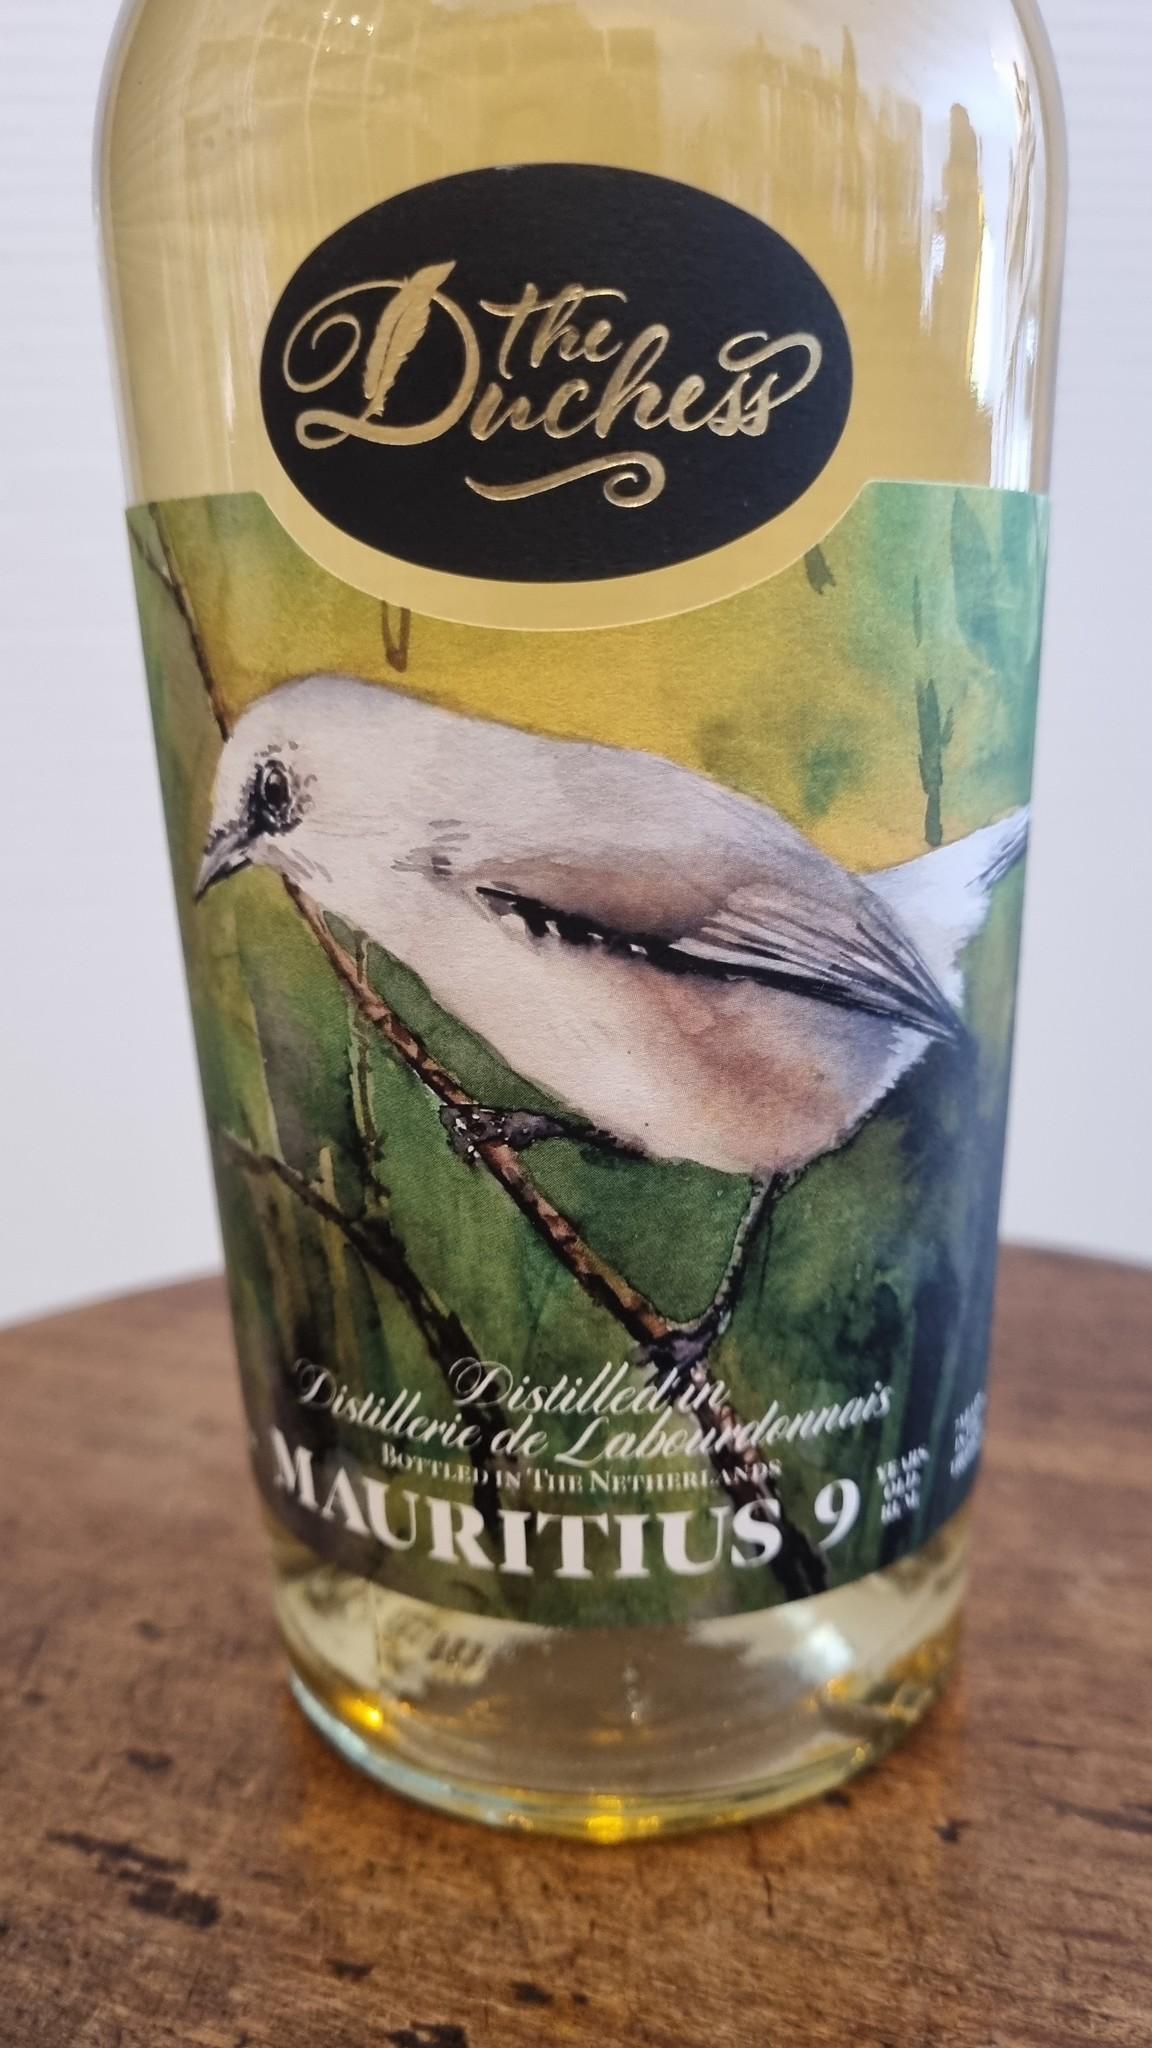 MAURITIUS RON 9Y 57.9% THE DUCHESS